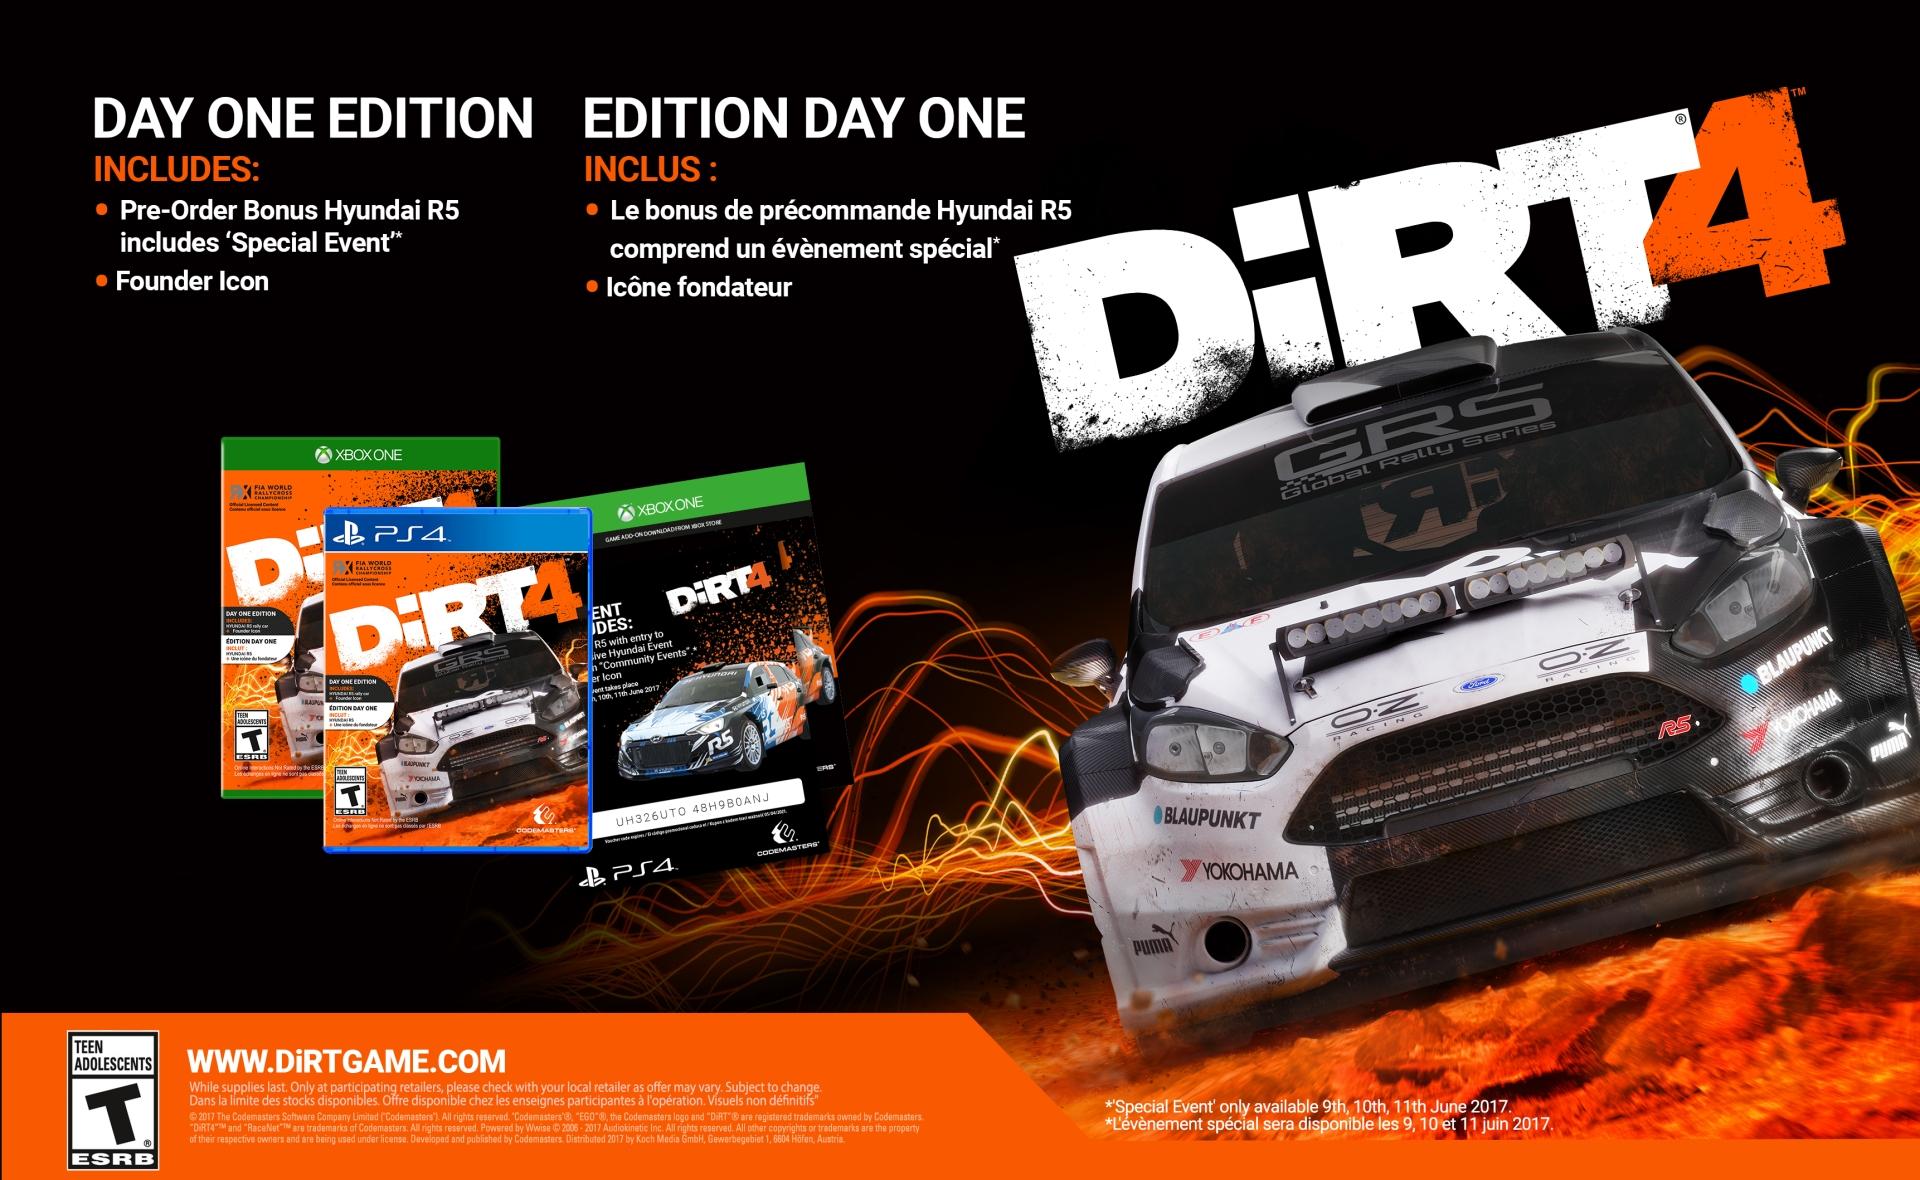 Dirt 4 Review - Όλα όσα πρέπει να ξέρετε για το καλύτερο Racing Game